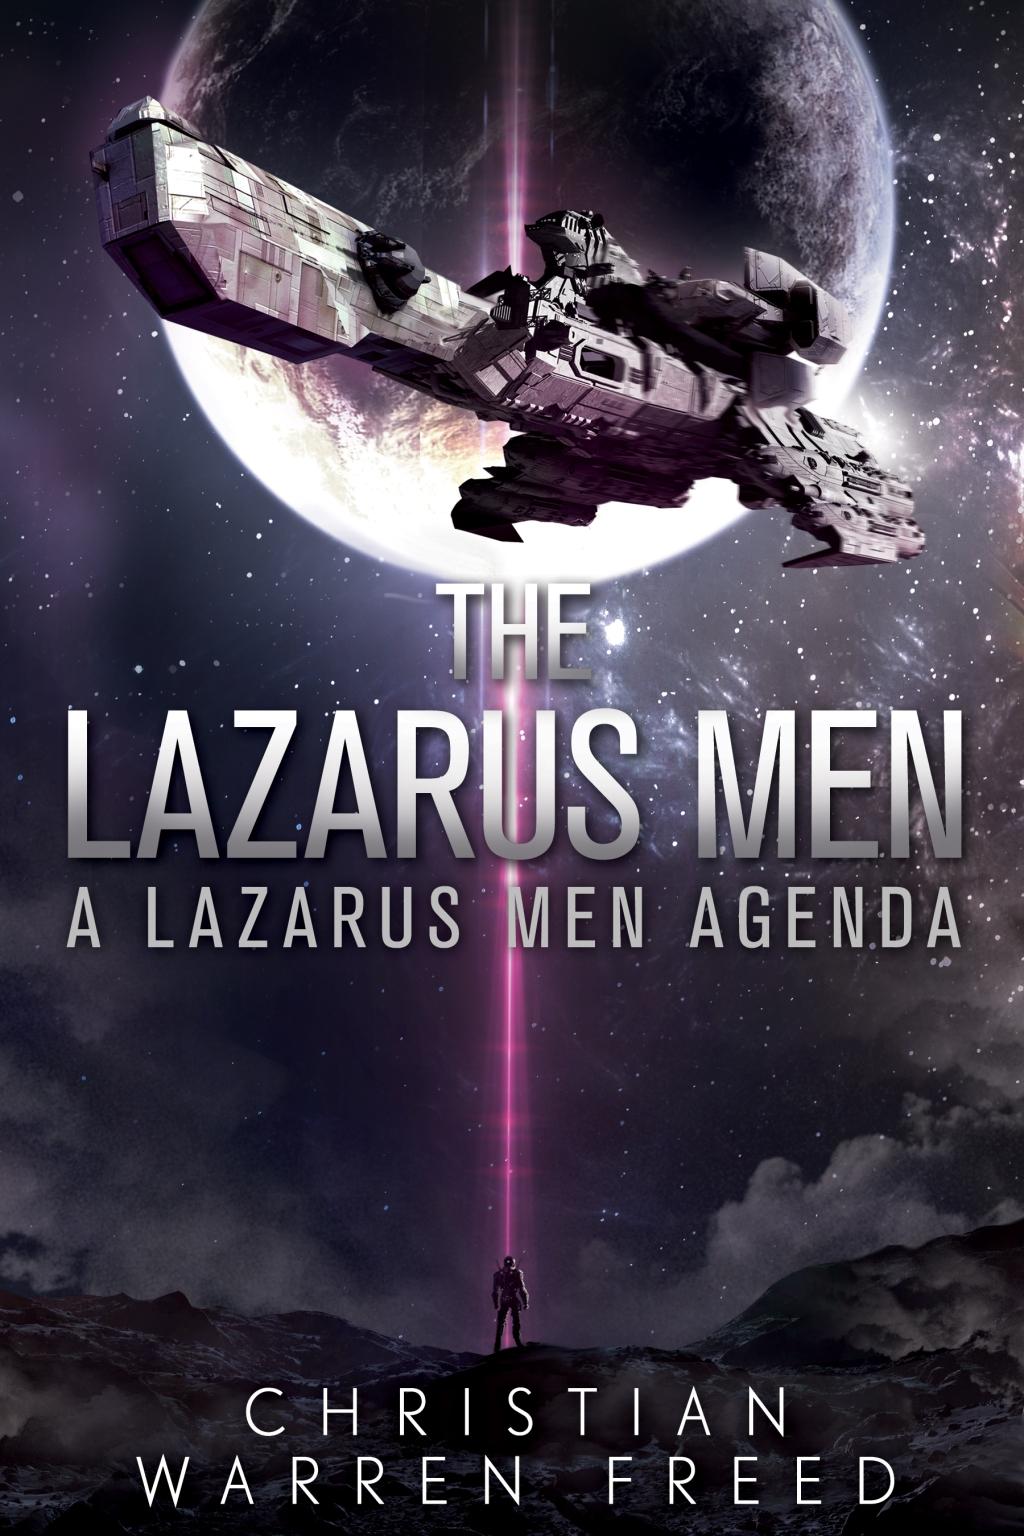 the lazarus men.jpg